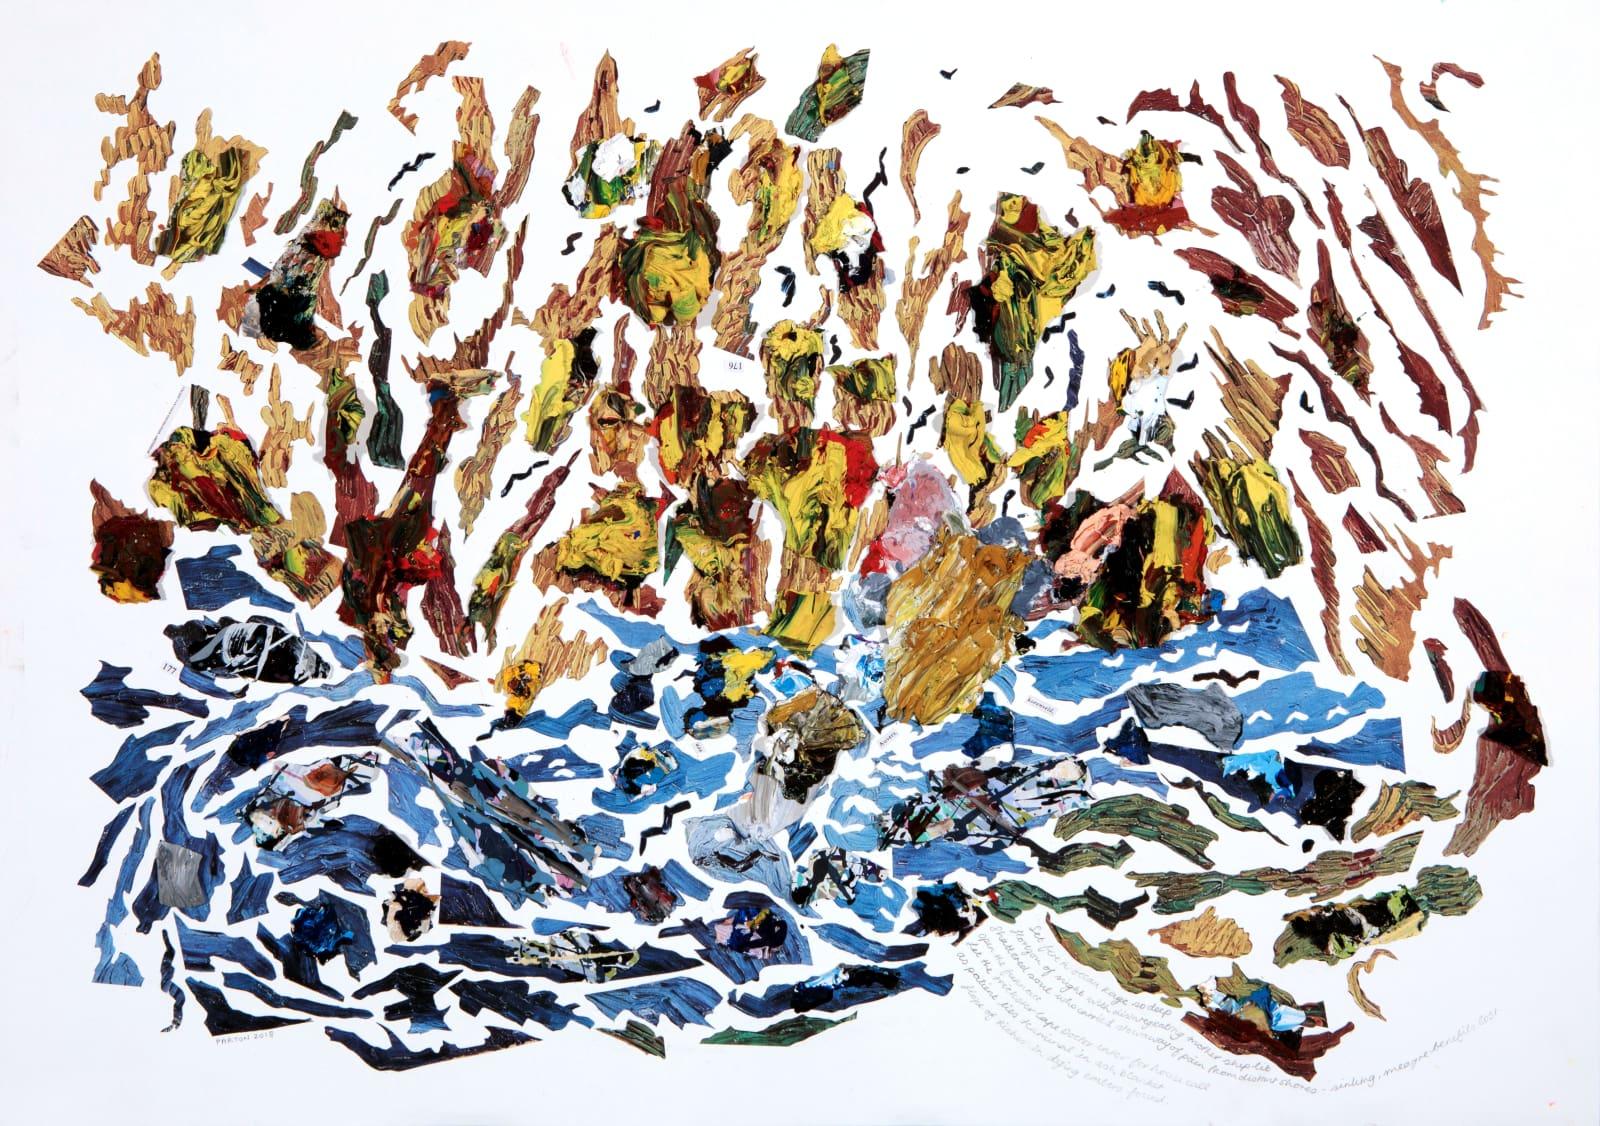 Carolyn Parton, Siren song - Wheatfields, 2018